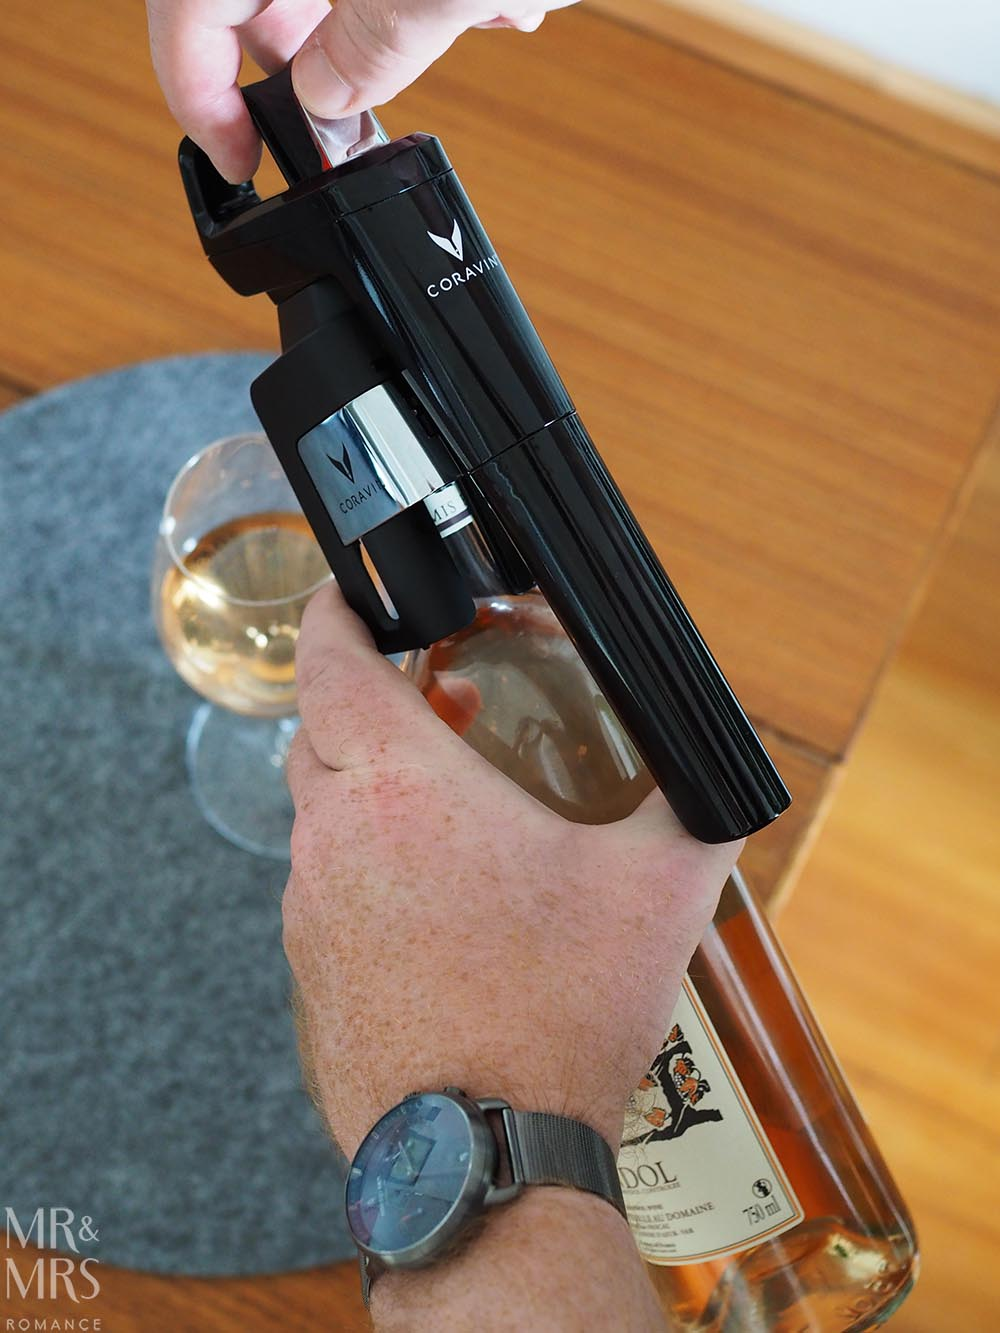 POV Coravin wine preservation system